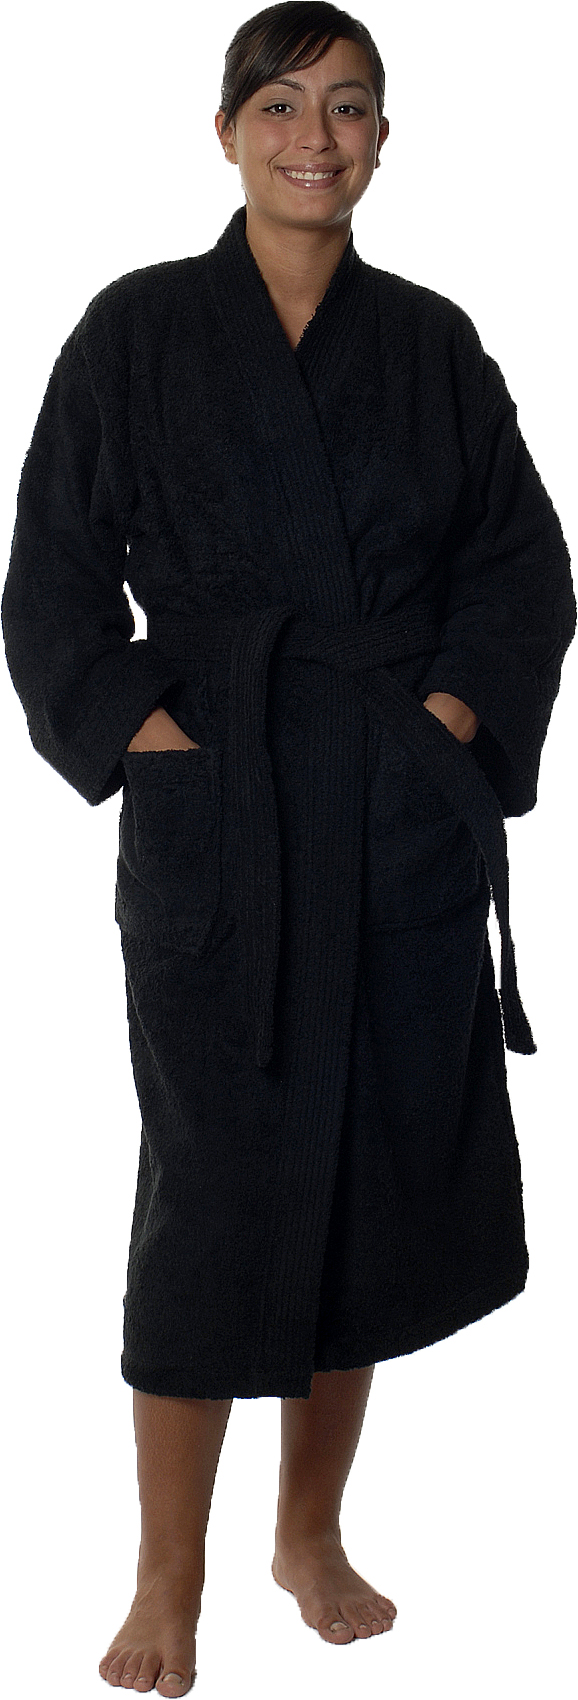 Peignoir col kimono en Coton couleur Noir Taille XL (Noir)